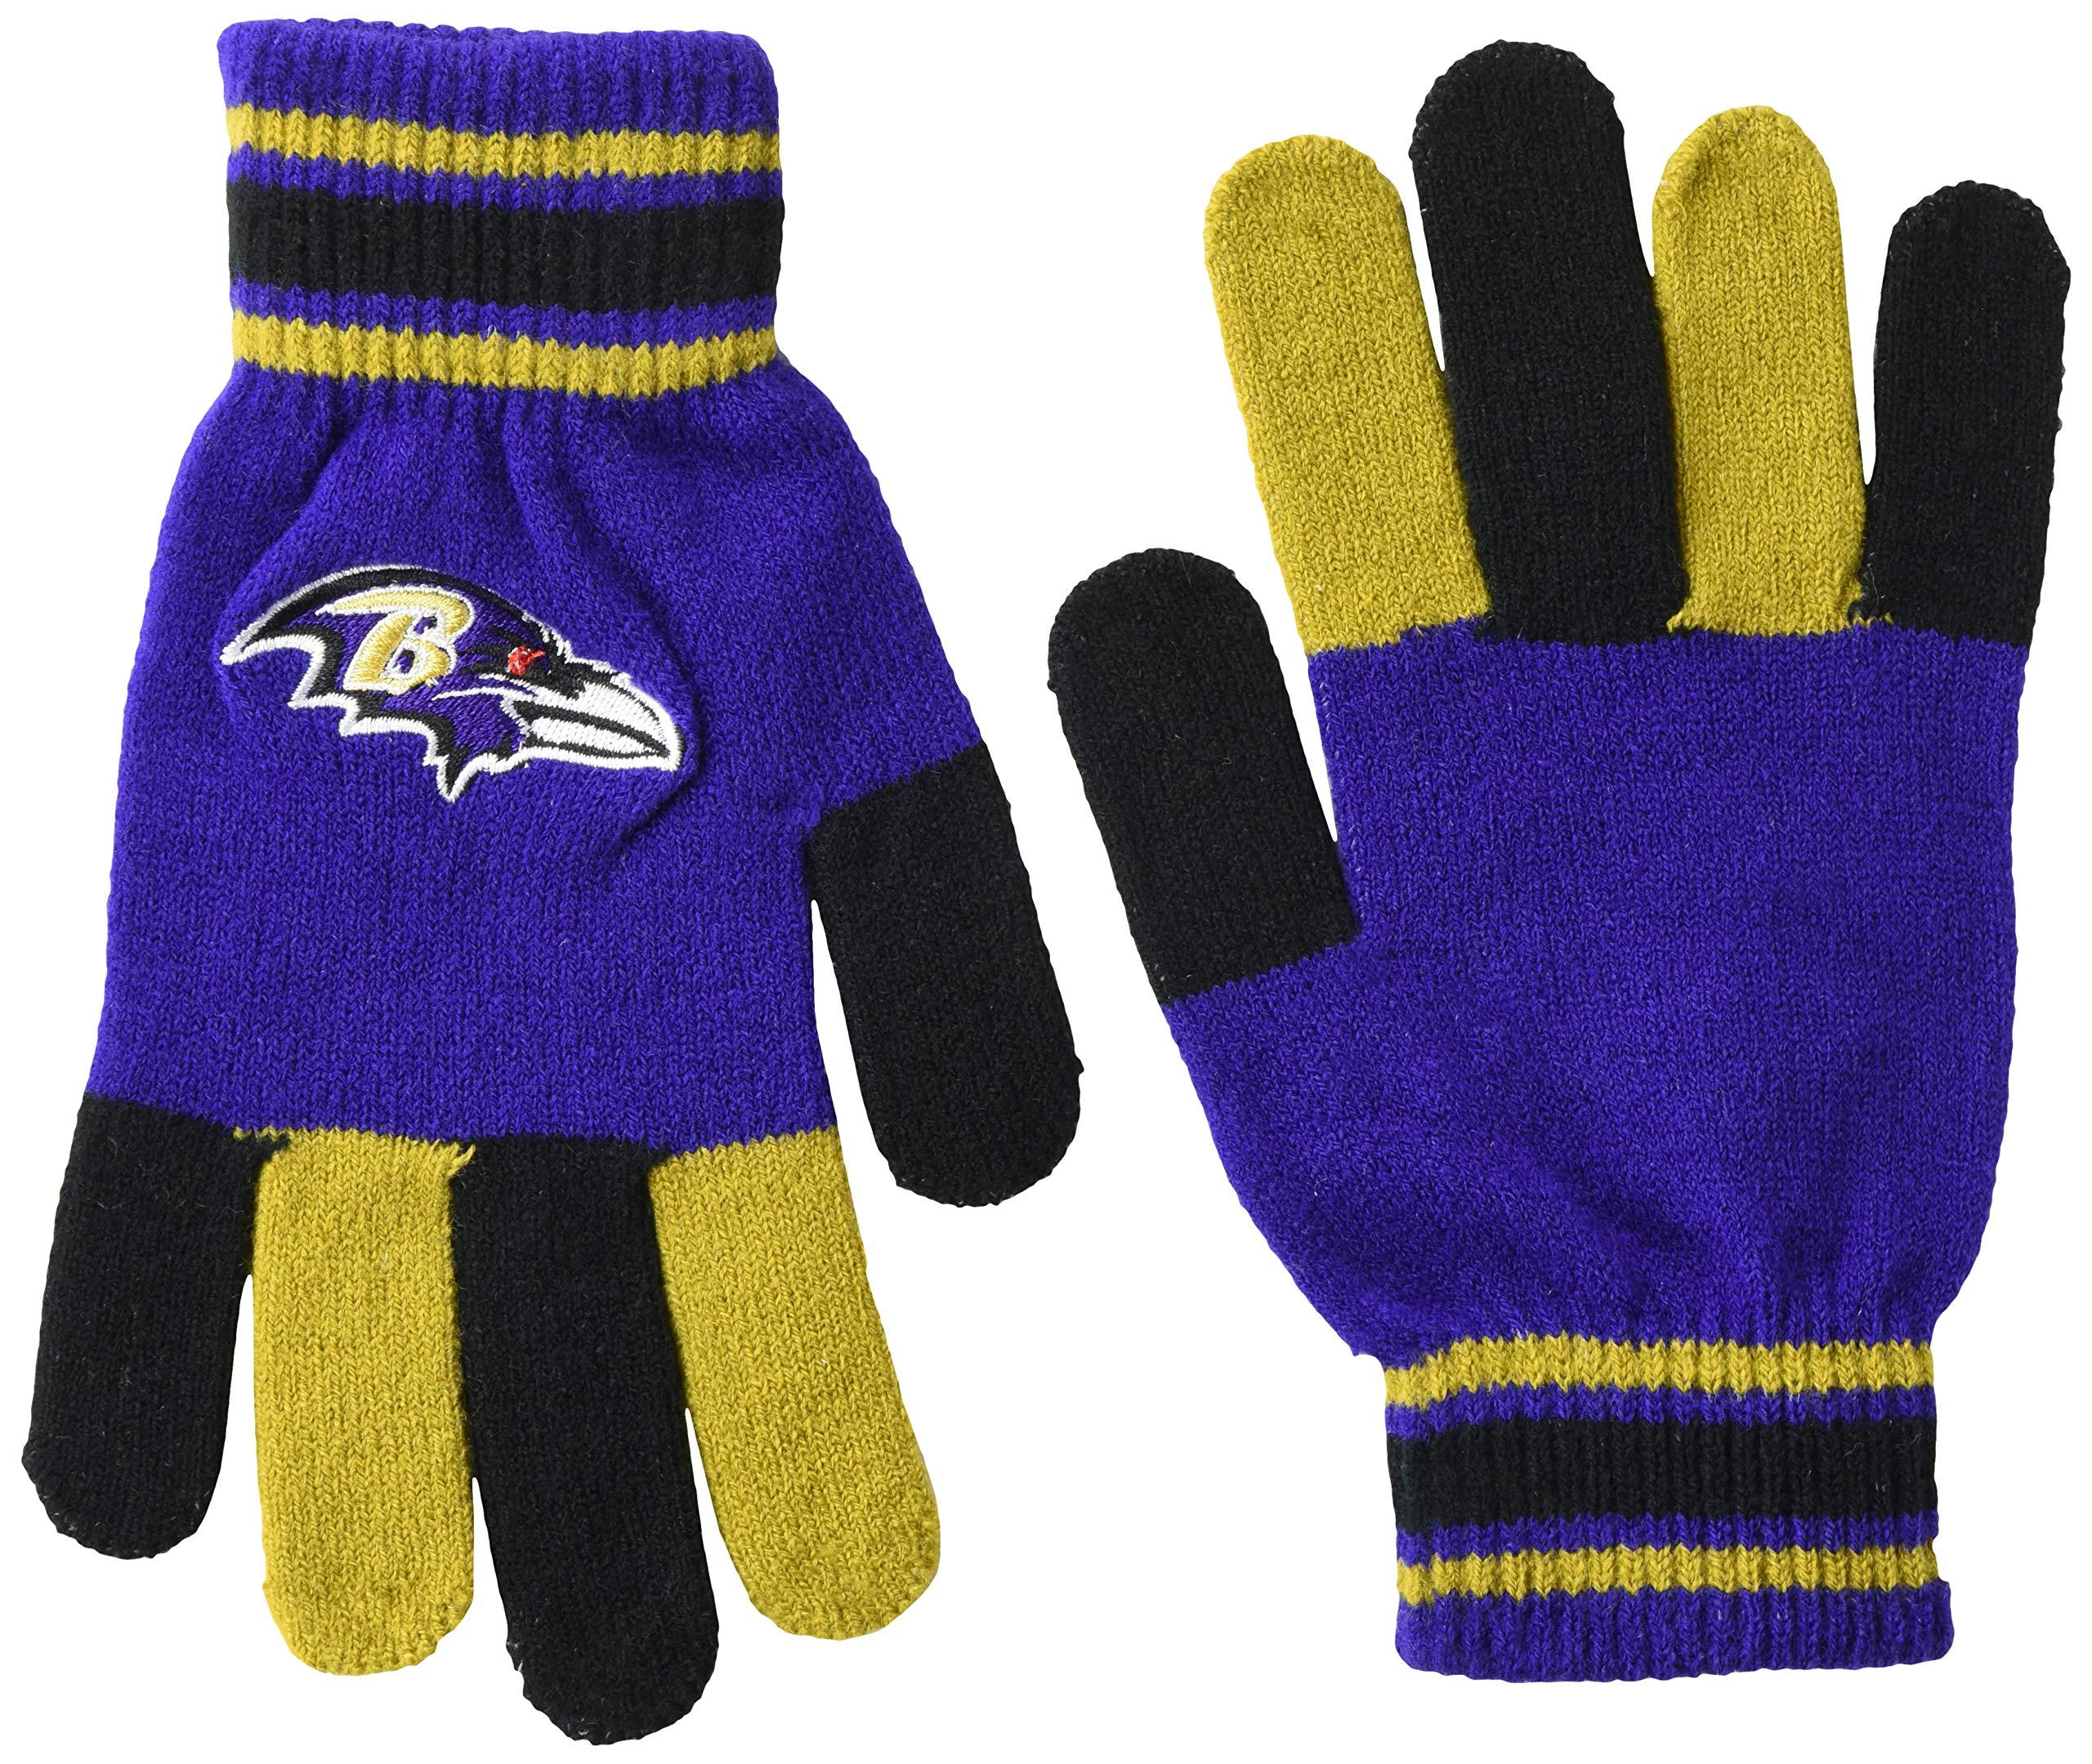 FOCO NFL Baltimore Ravens Multi Color Team Knit Glove, Team Color, One Size